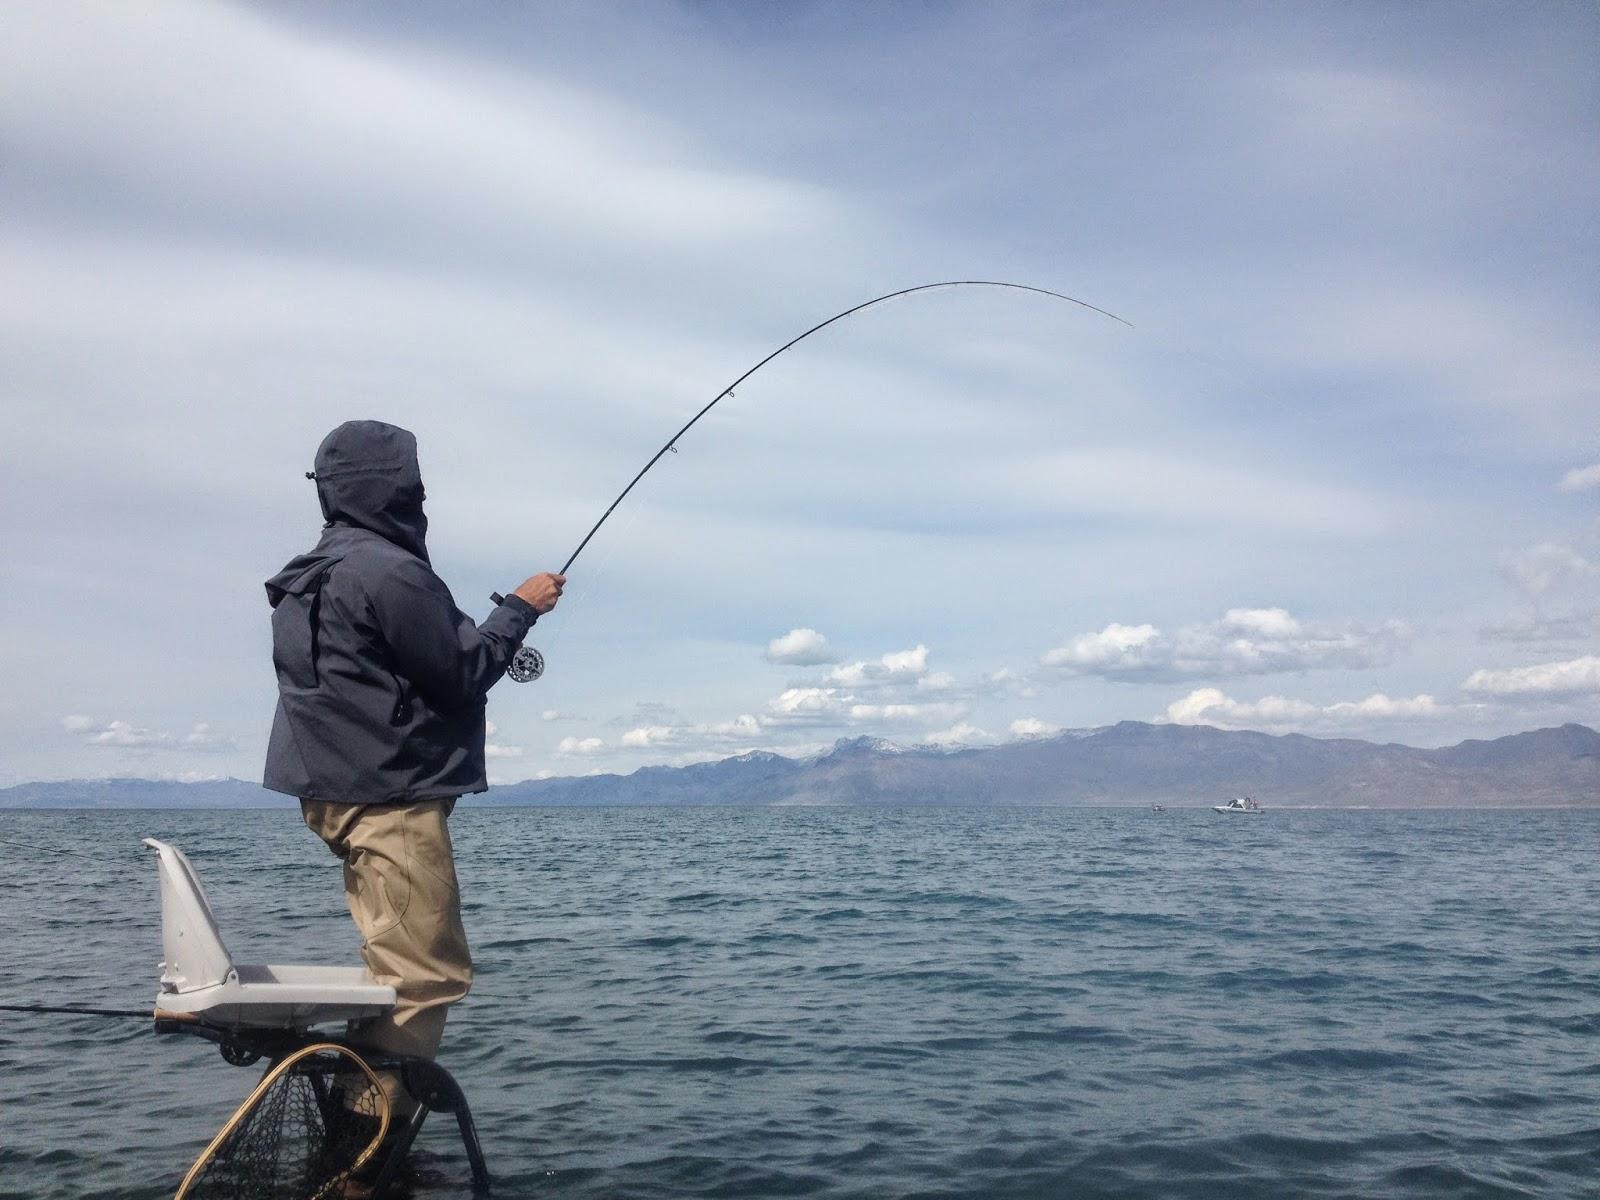 Northern sierra fly fishing pyramid lake report 4 7 14 for Pyramid lake fishing report